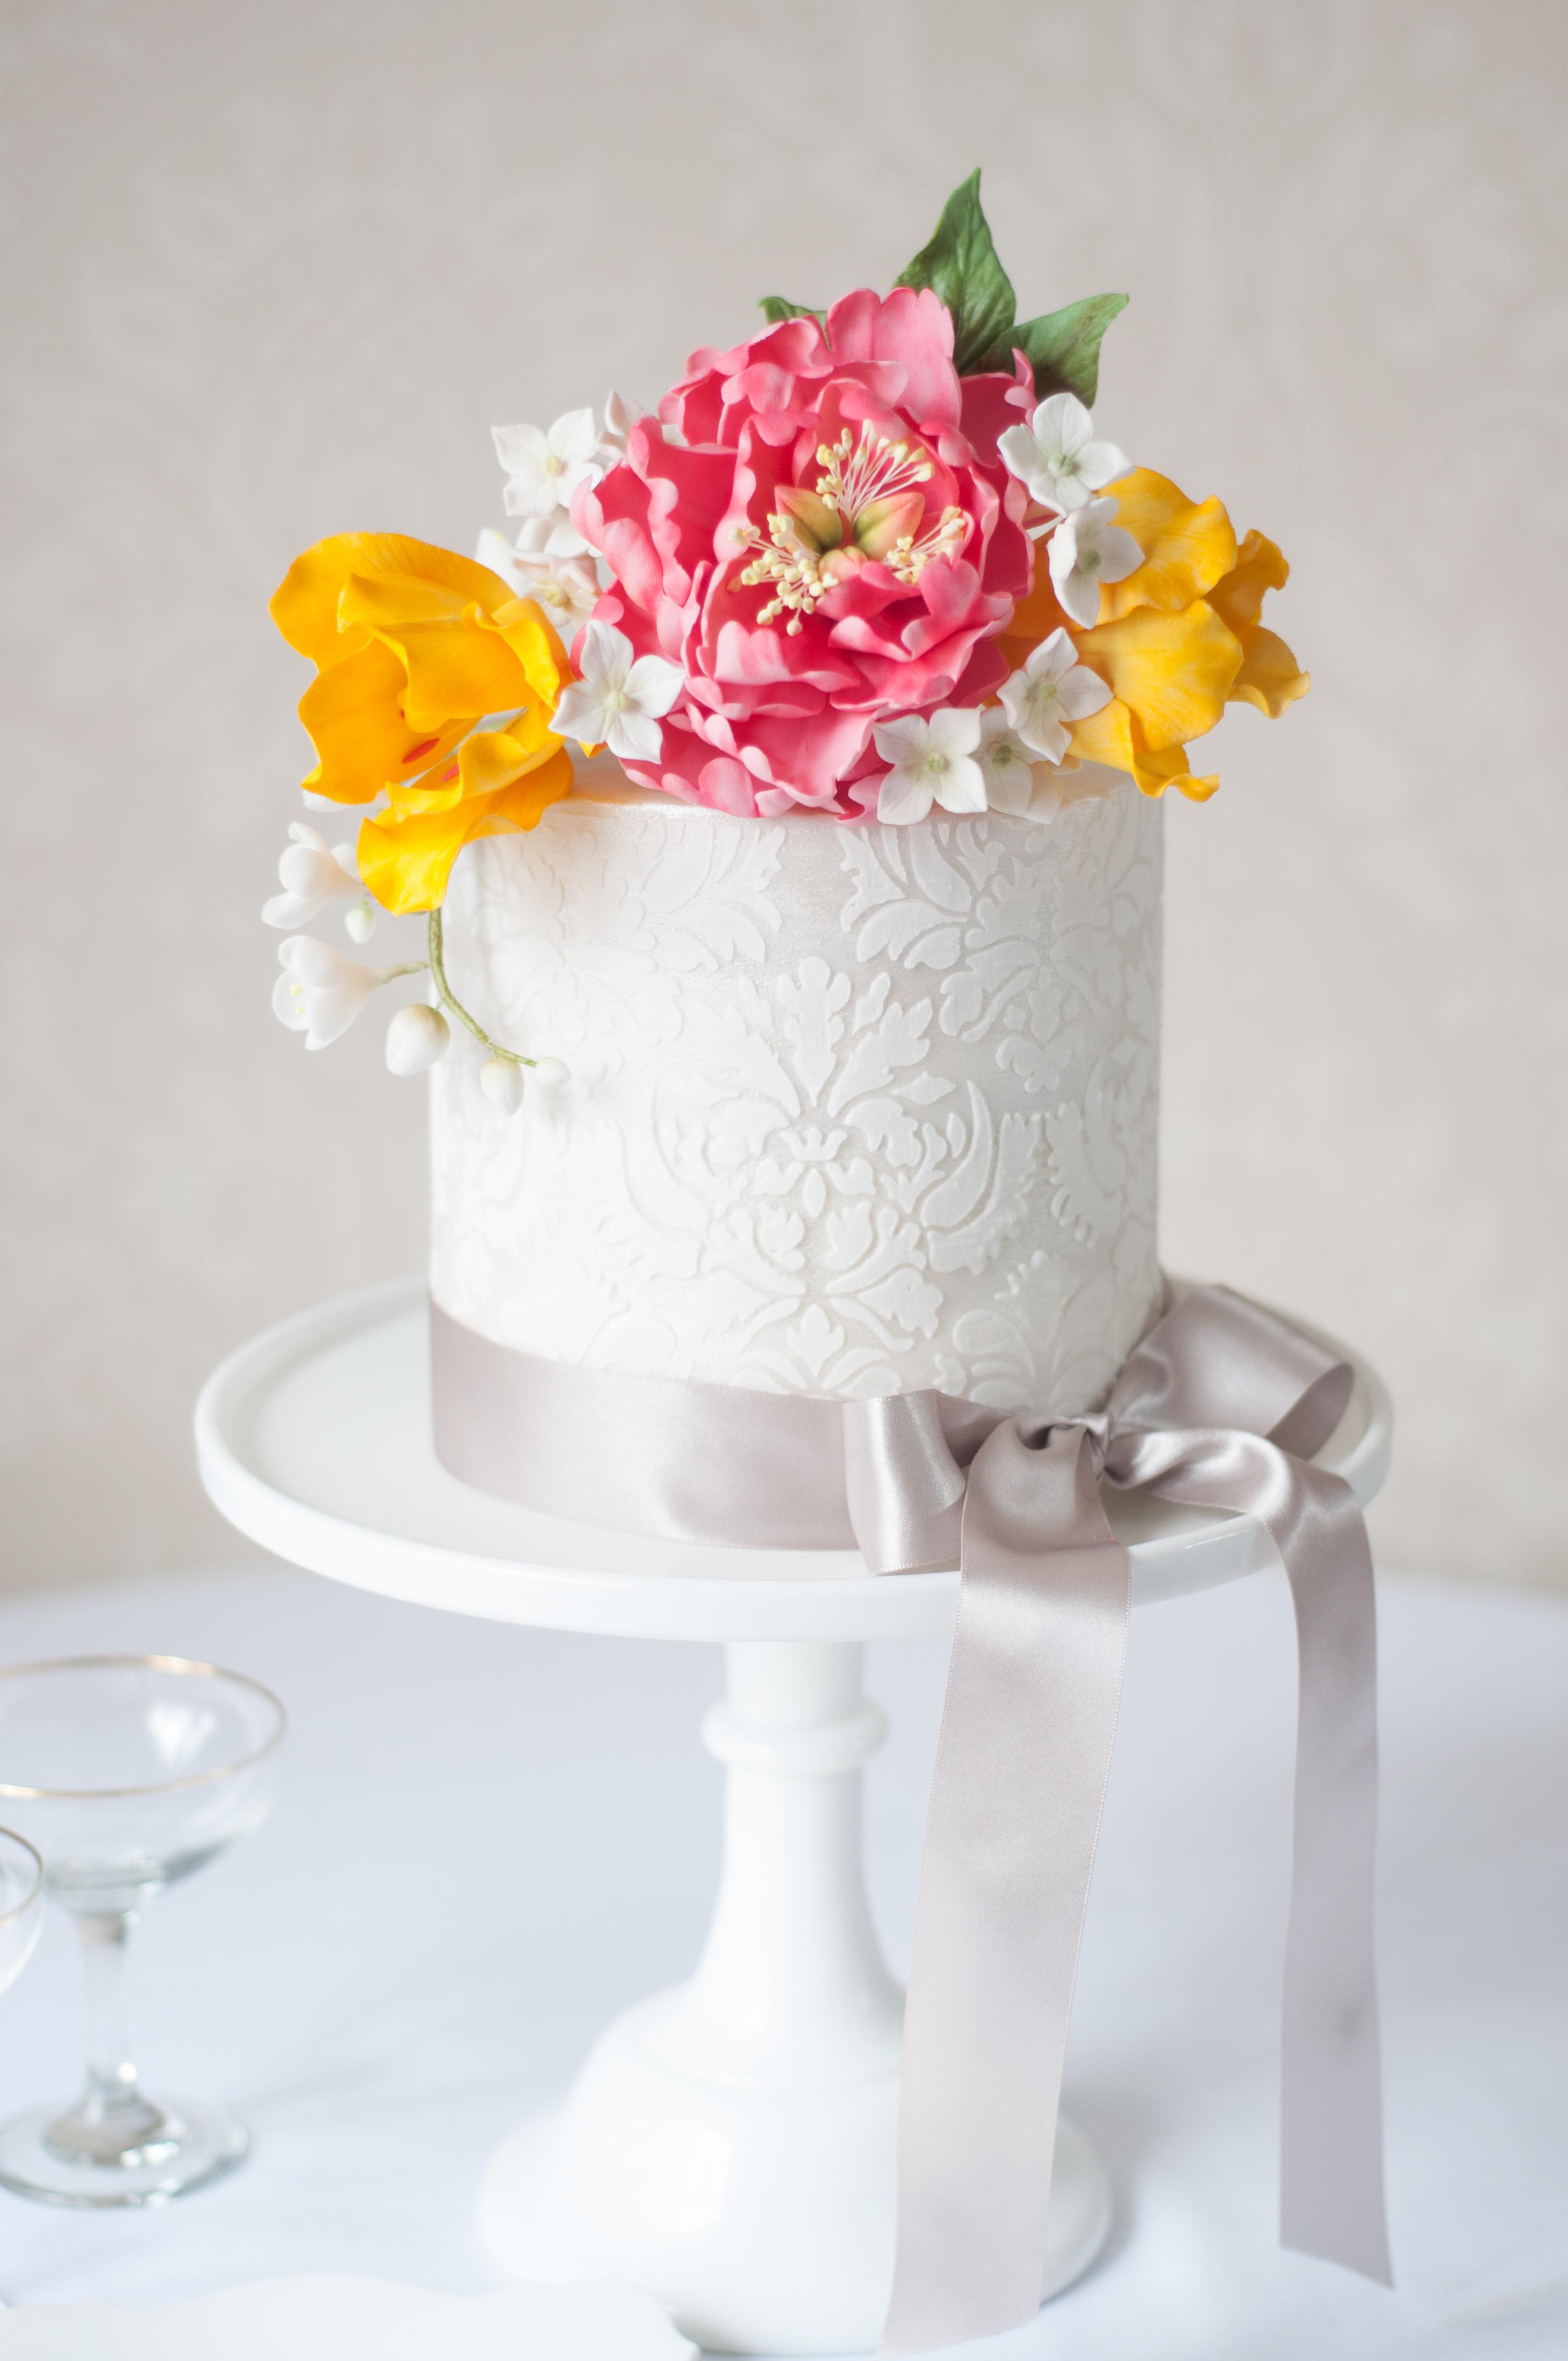 Damask fondant wedding cake with sugar peony and tulips